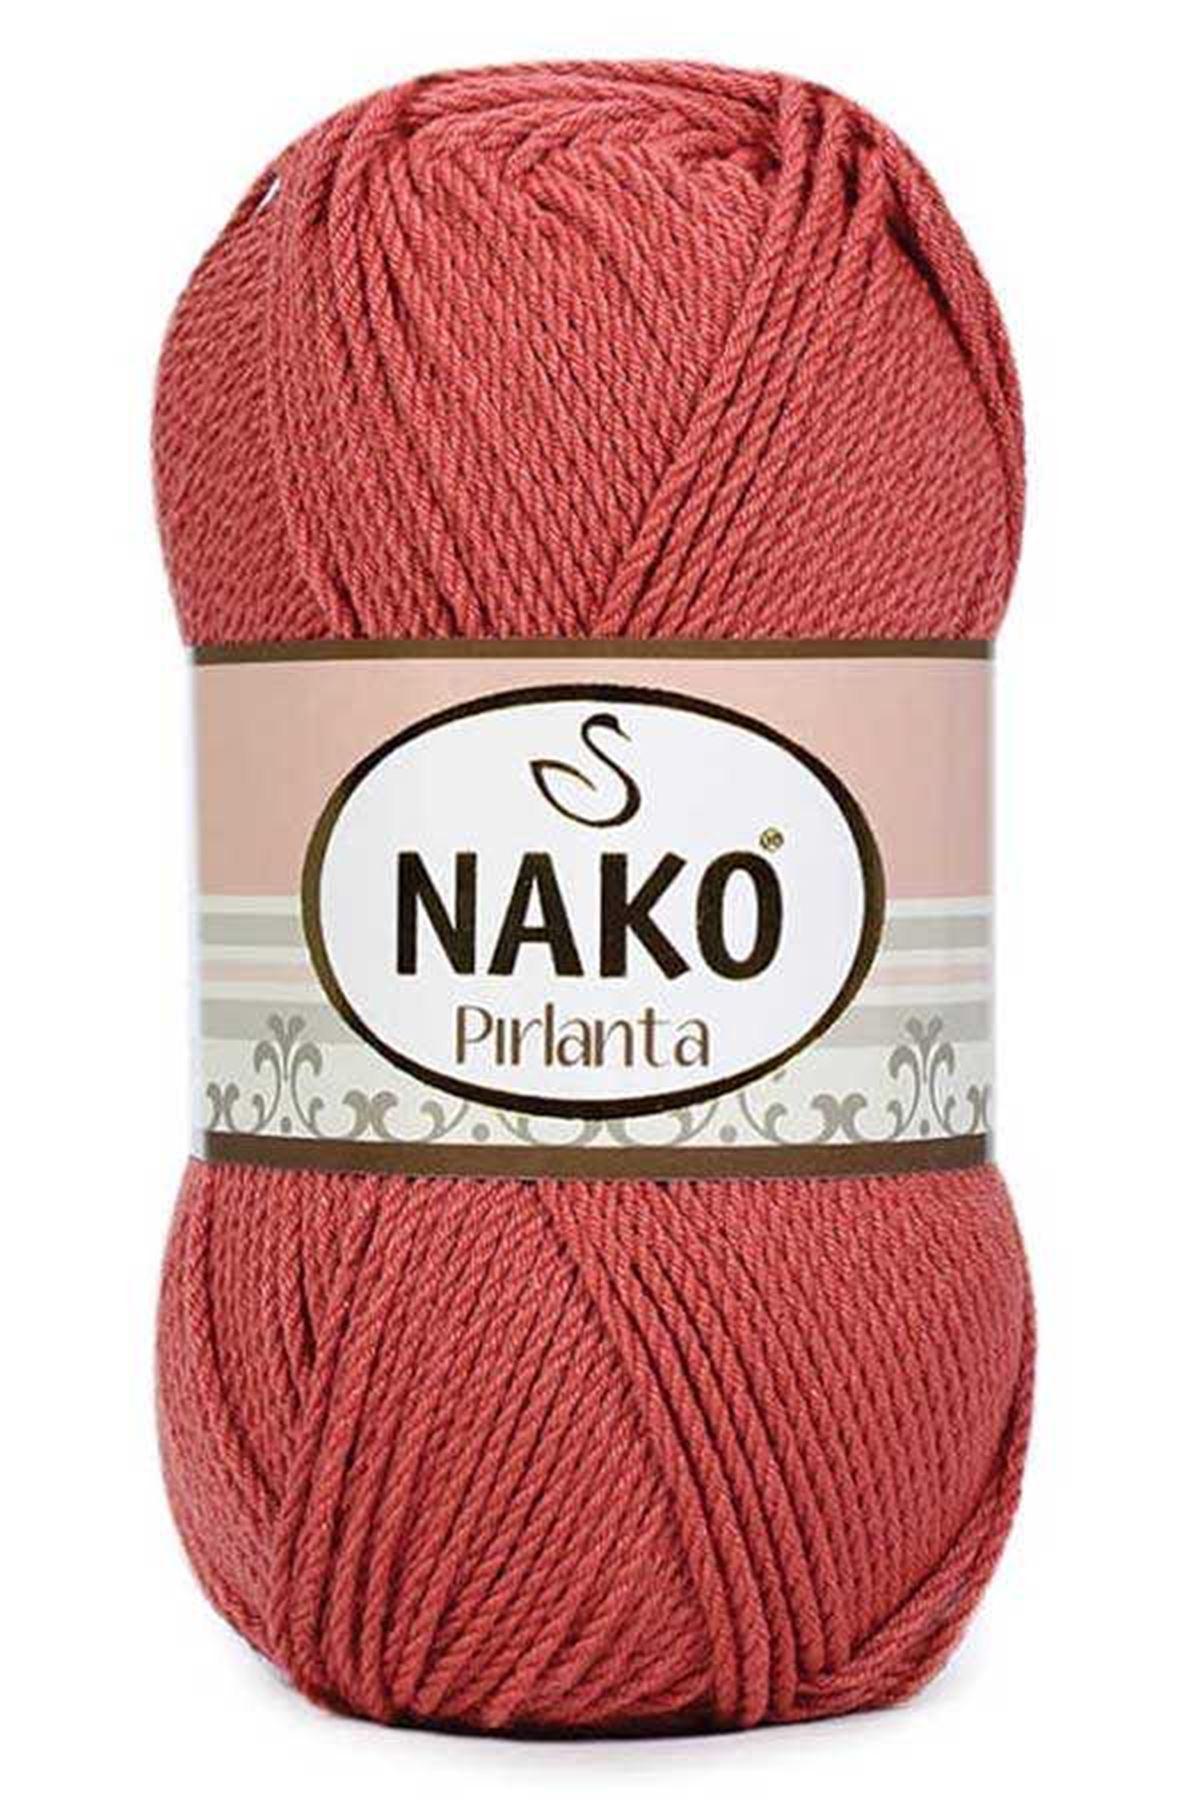 Nako Pırlanta-11252 Marsala